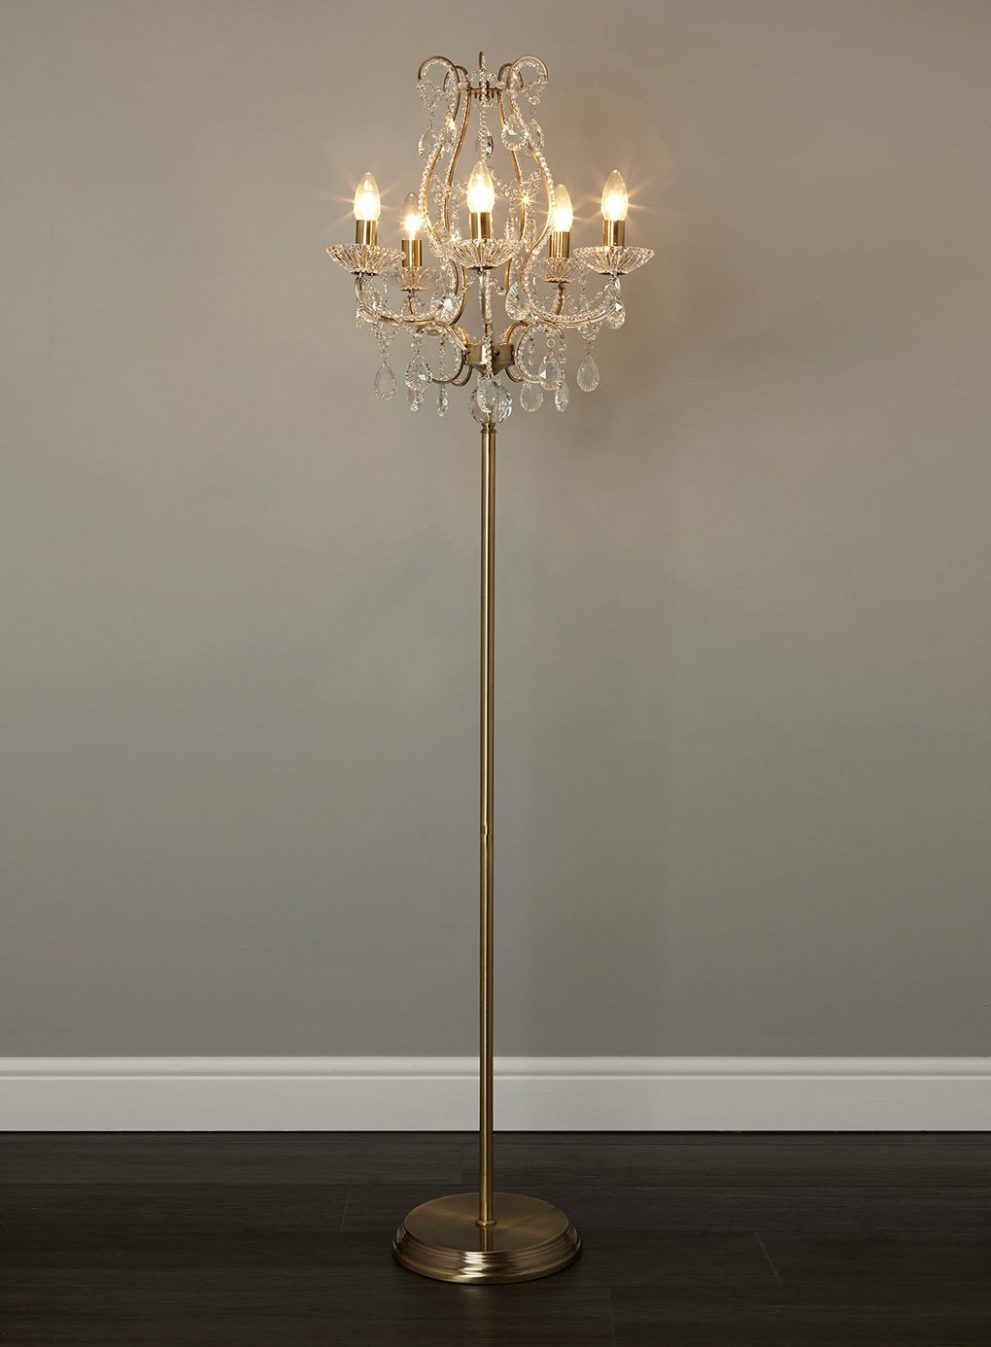 Chandelier Floor Lamps Uk Images Home Furniture Ideas With Regard To Chandelier Standing Lamps (View 8 of 25)